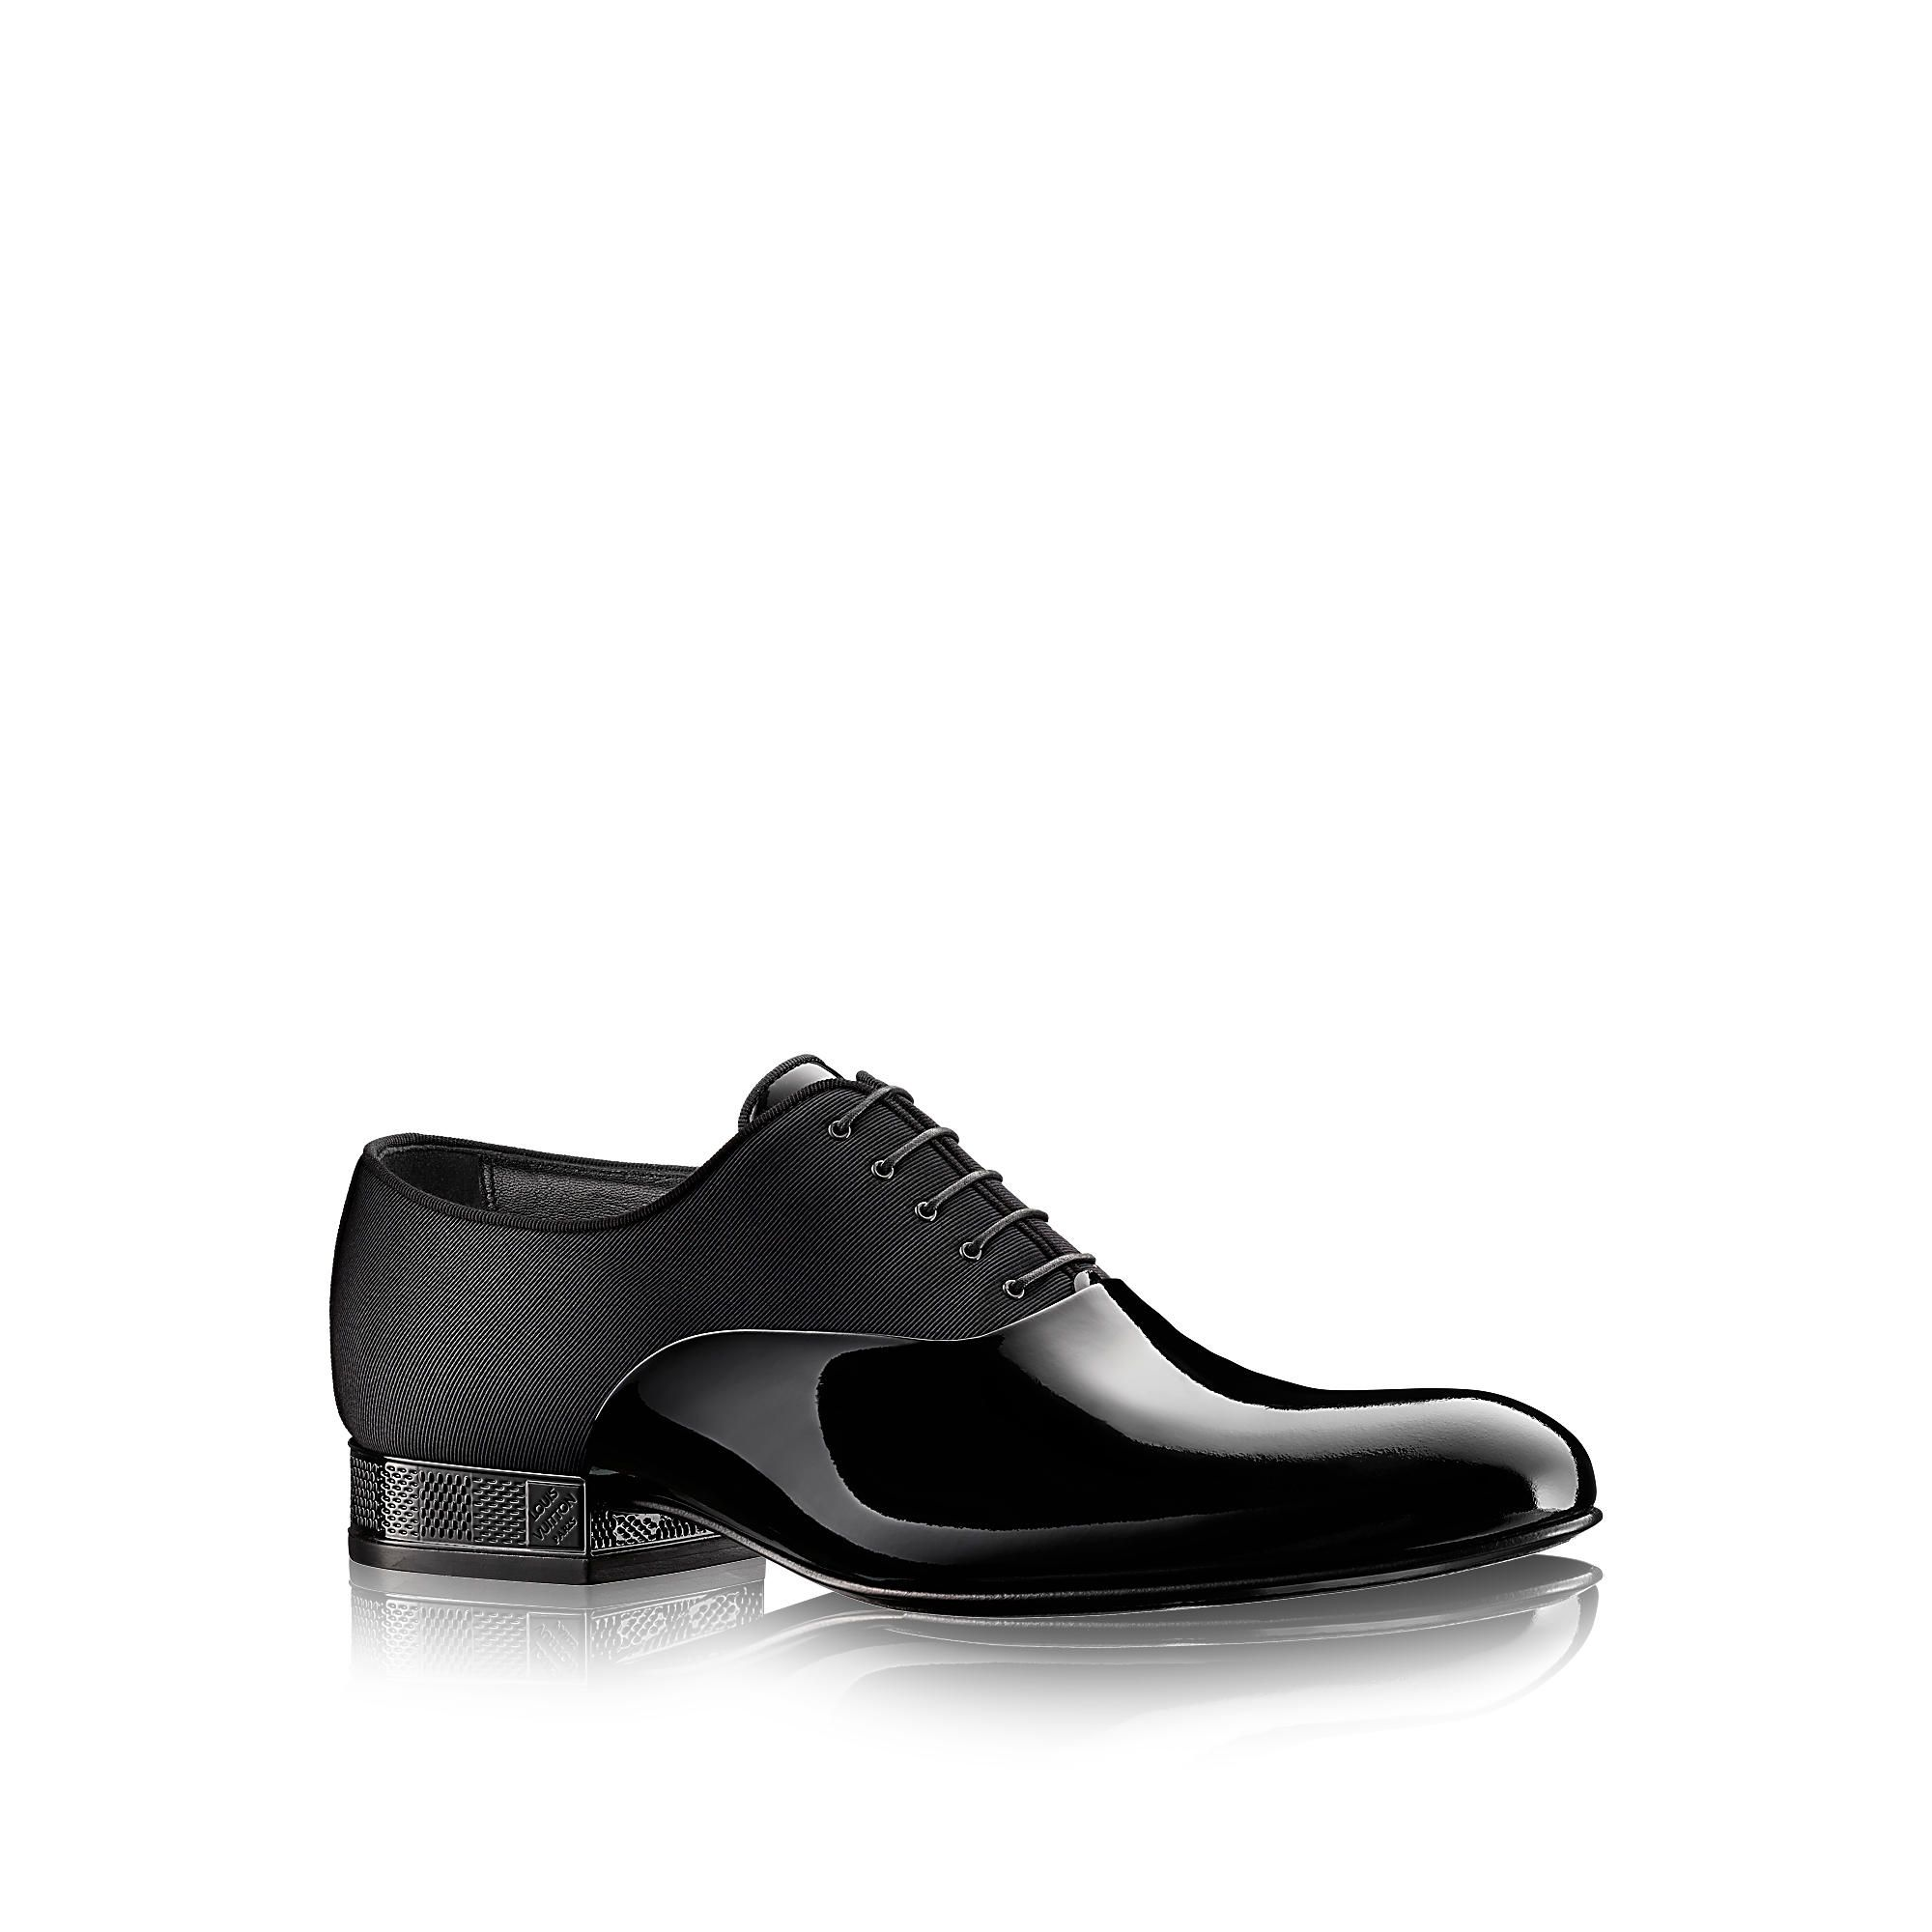 key:product_page_share_discover_product Ballroom Richelieu via Louis Vuitton